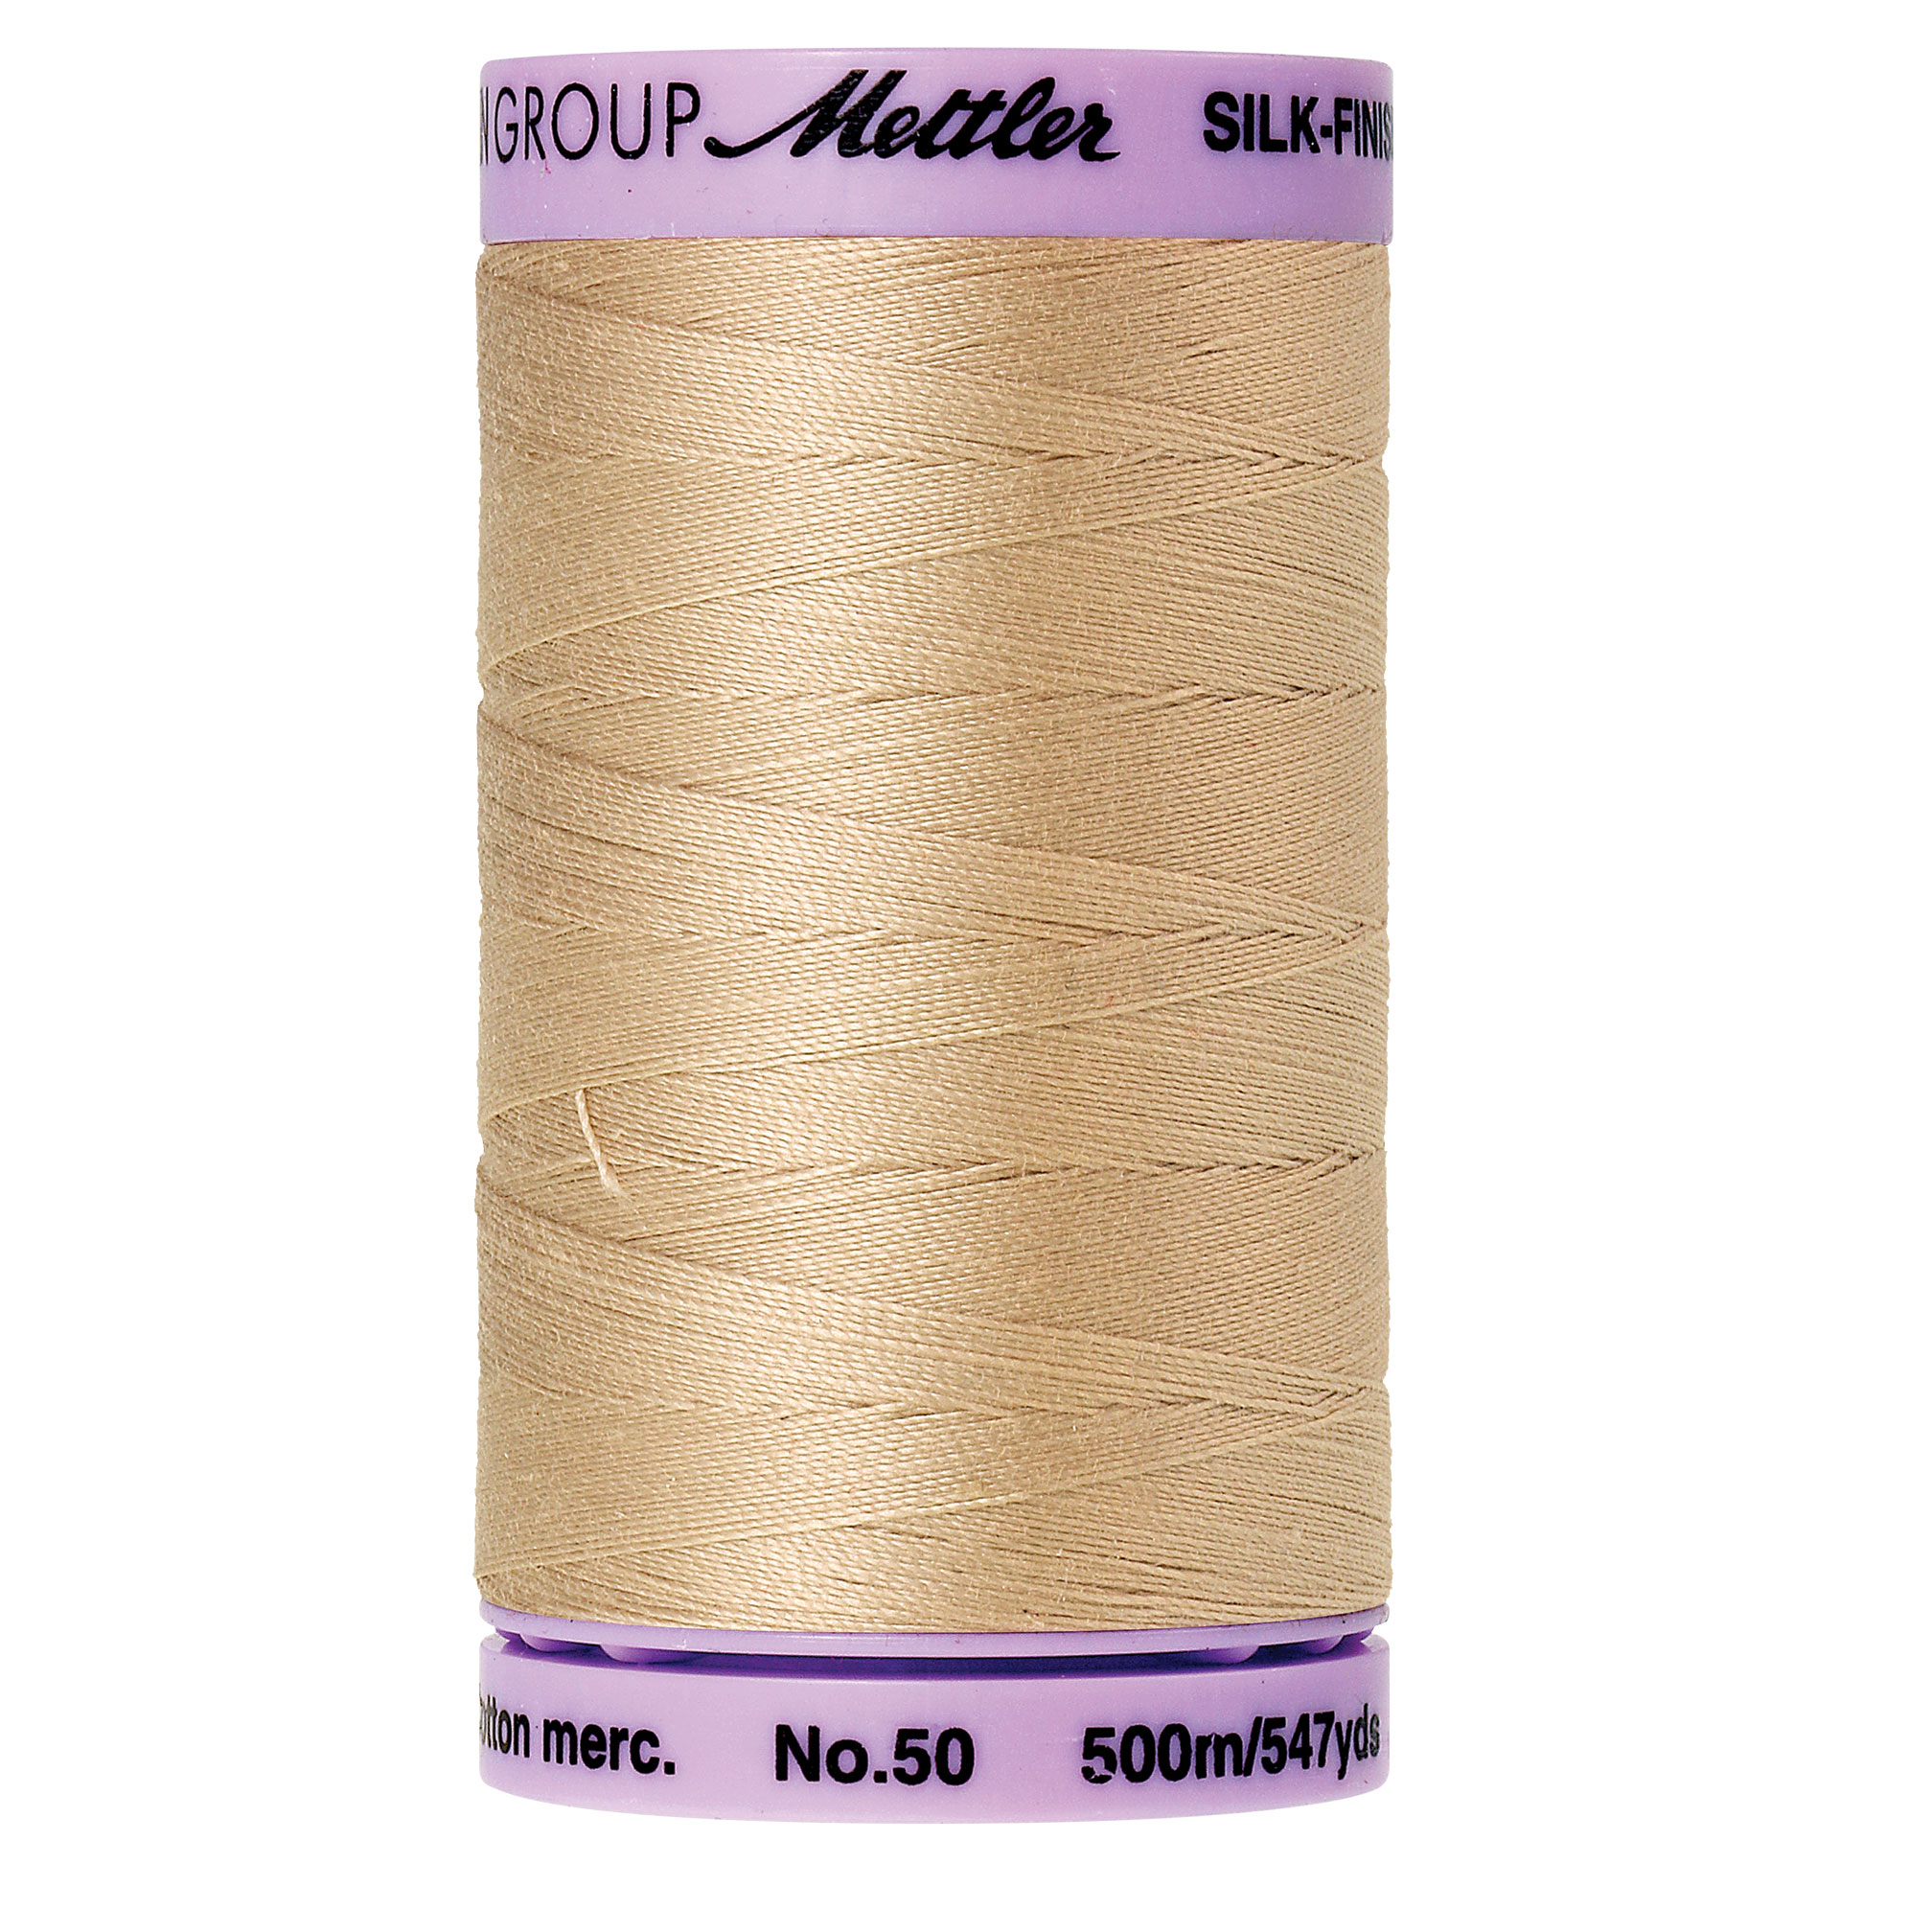 Mettler Silk-Finish 50wt Cotton Thread 547yd.  9104-0537